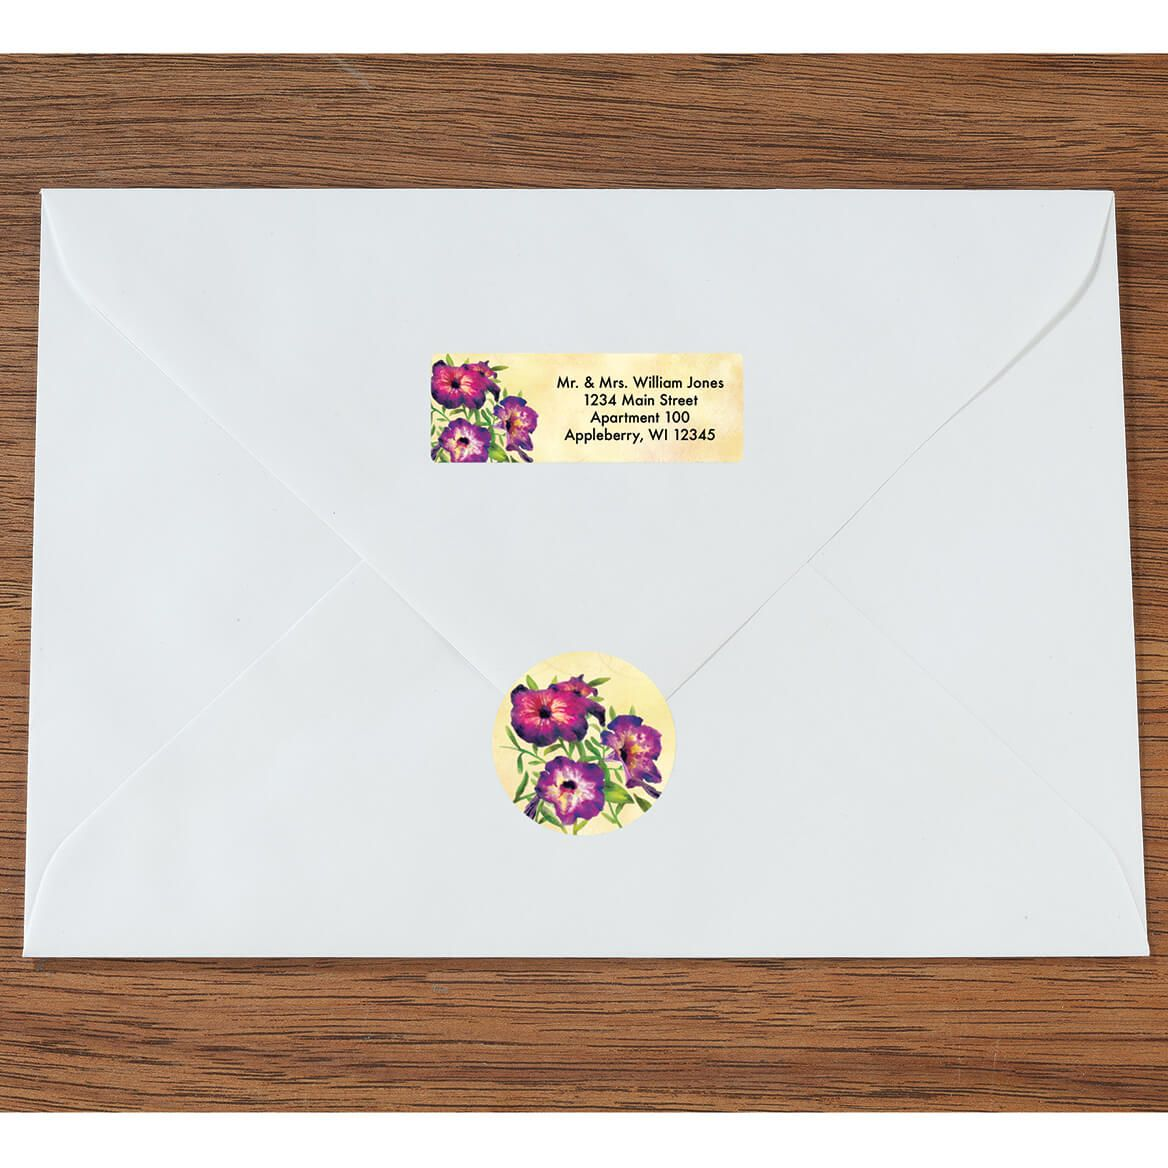 Personalized Floral Labels & Envelope Seals 60-365591